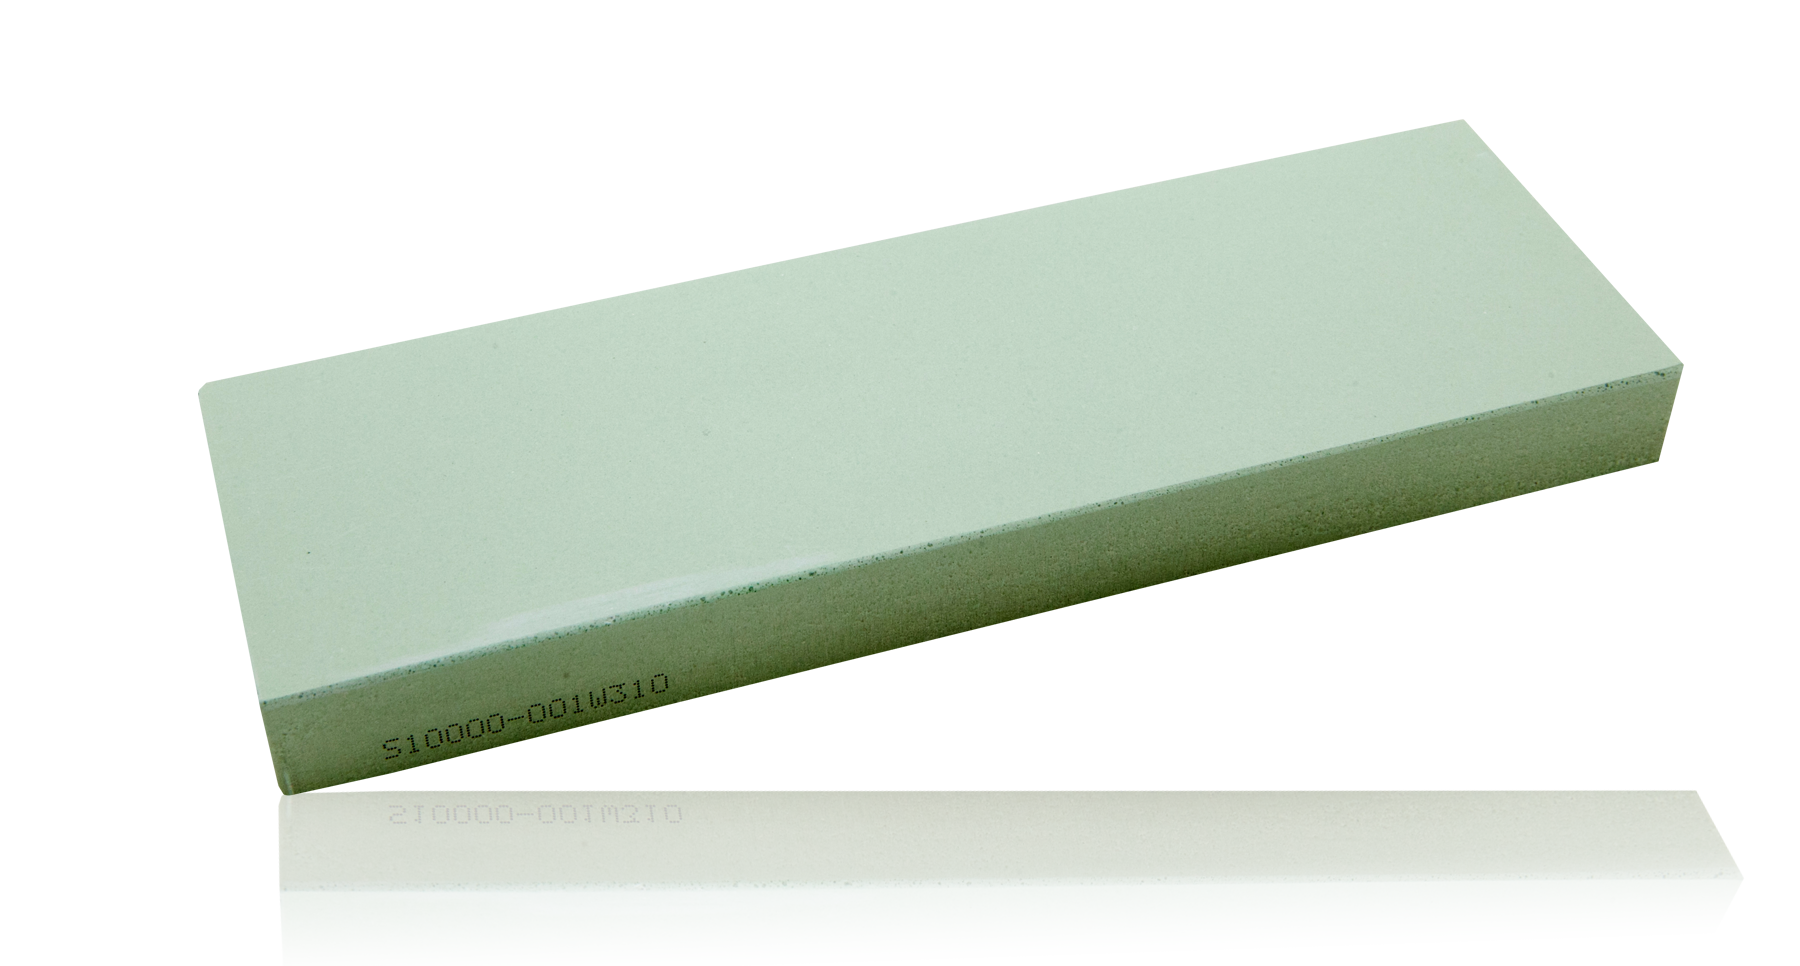 Камень точильный Naniwa S-490